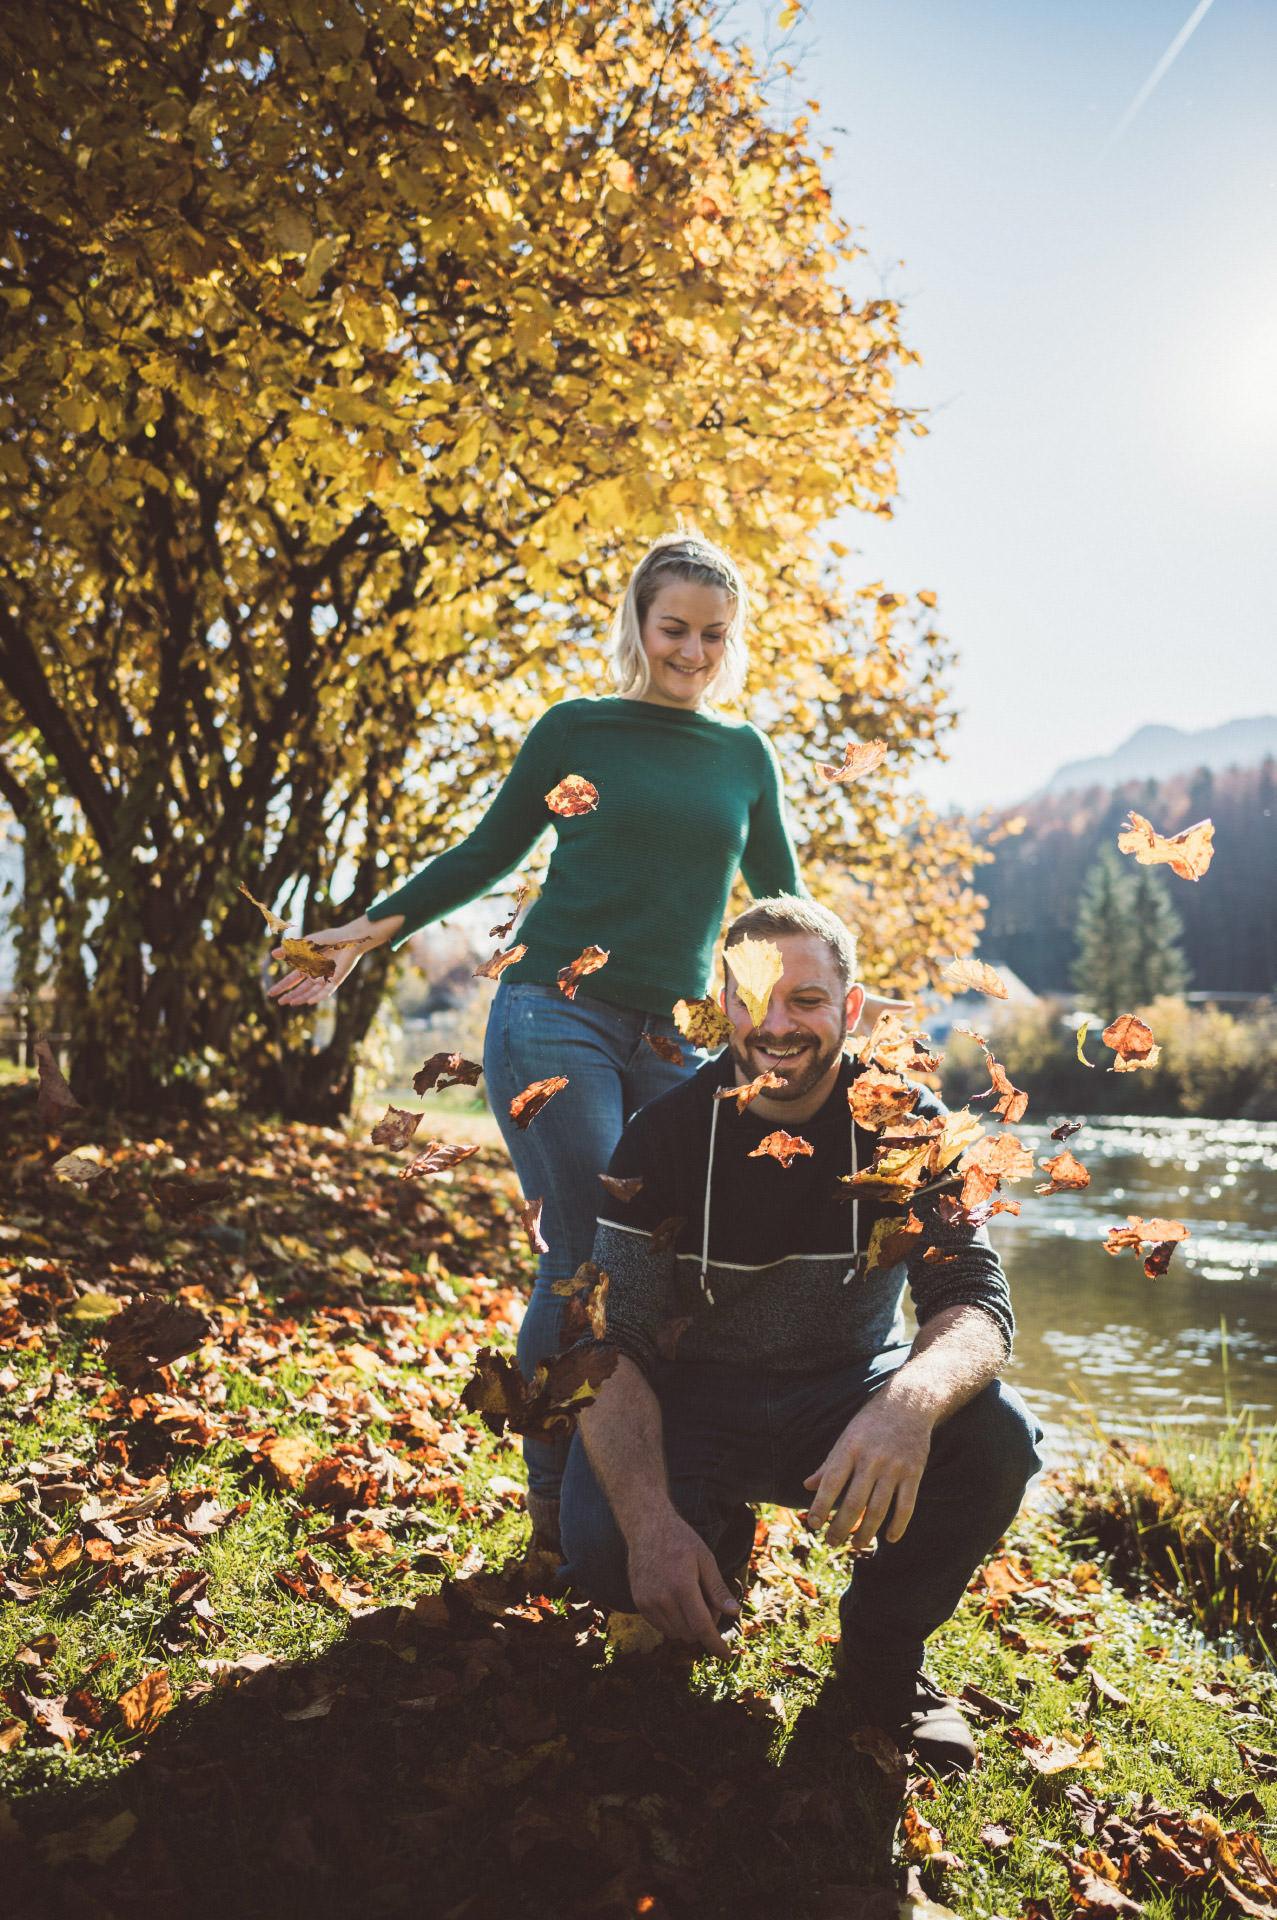 Fototips - im Herbst